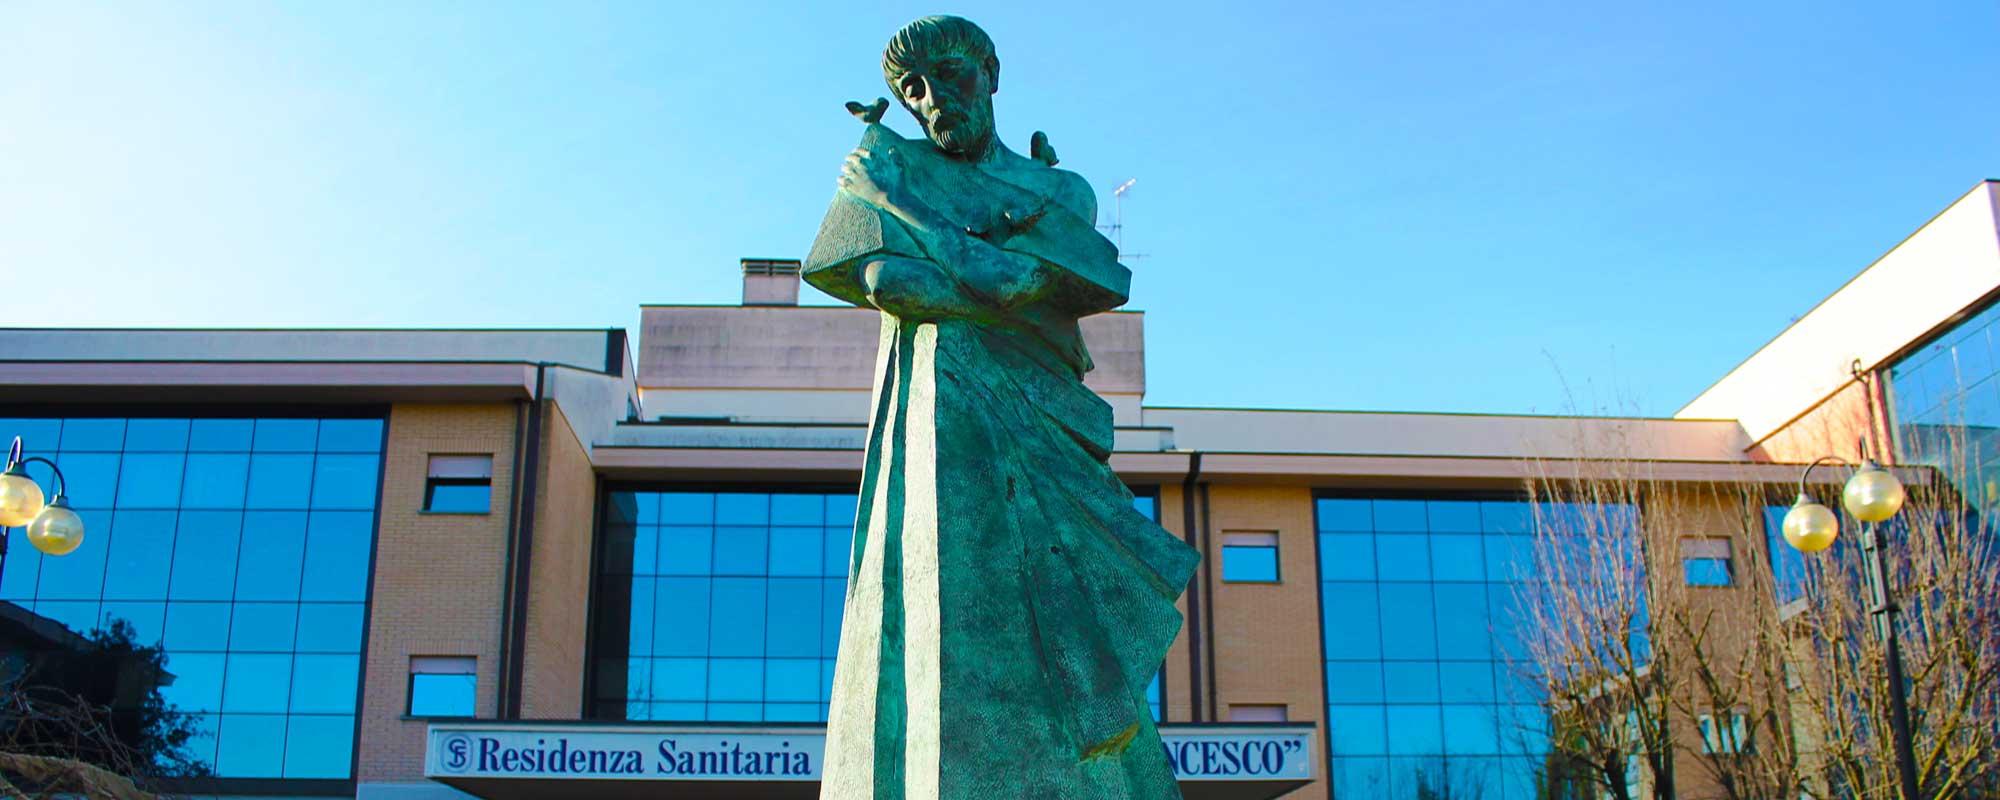 <h1> San  Francesco </h1> <h2> Società Cooperativa Sociale </h2>